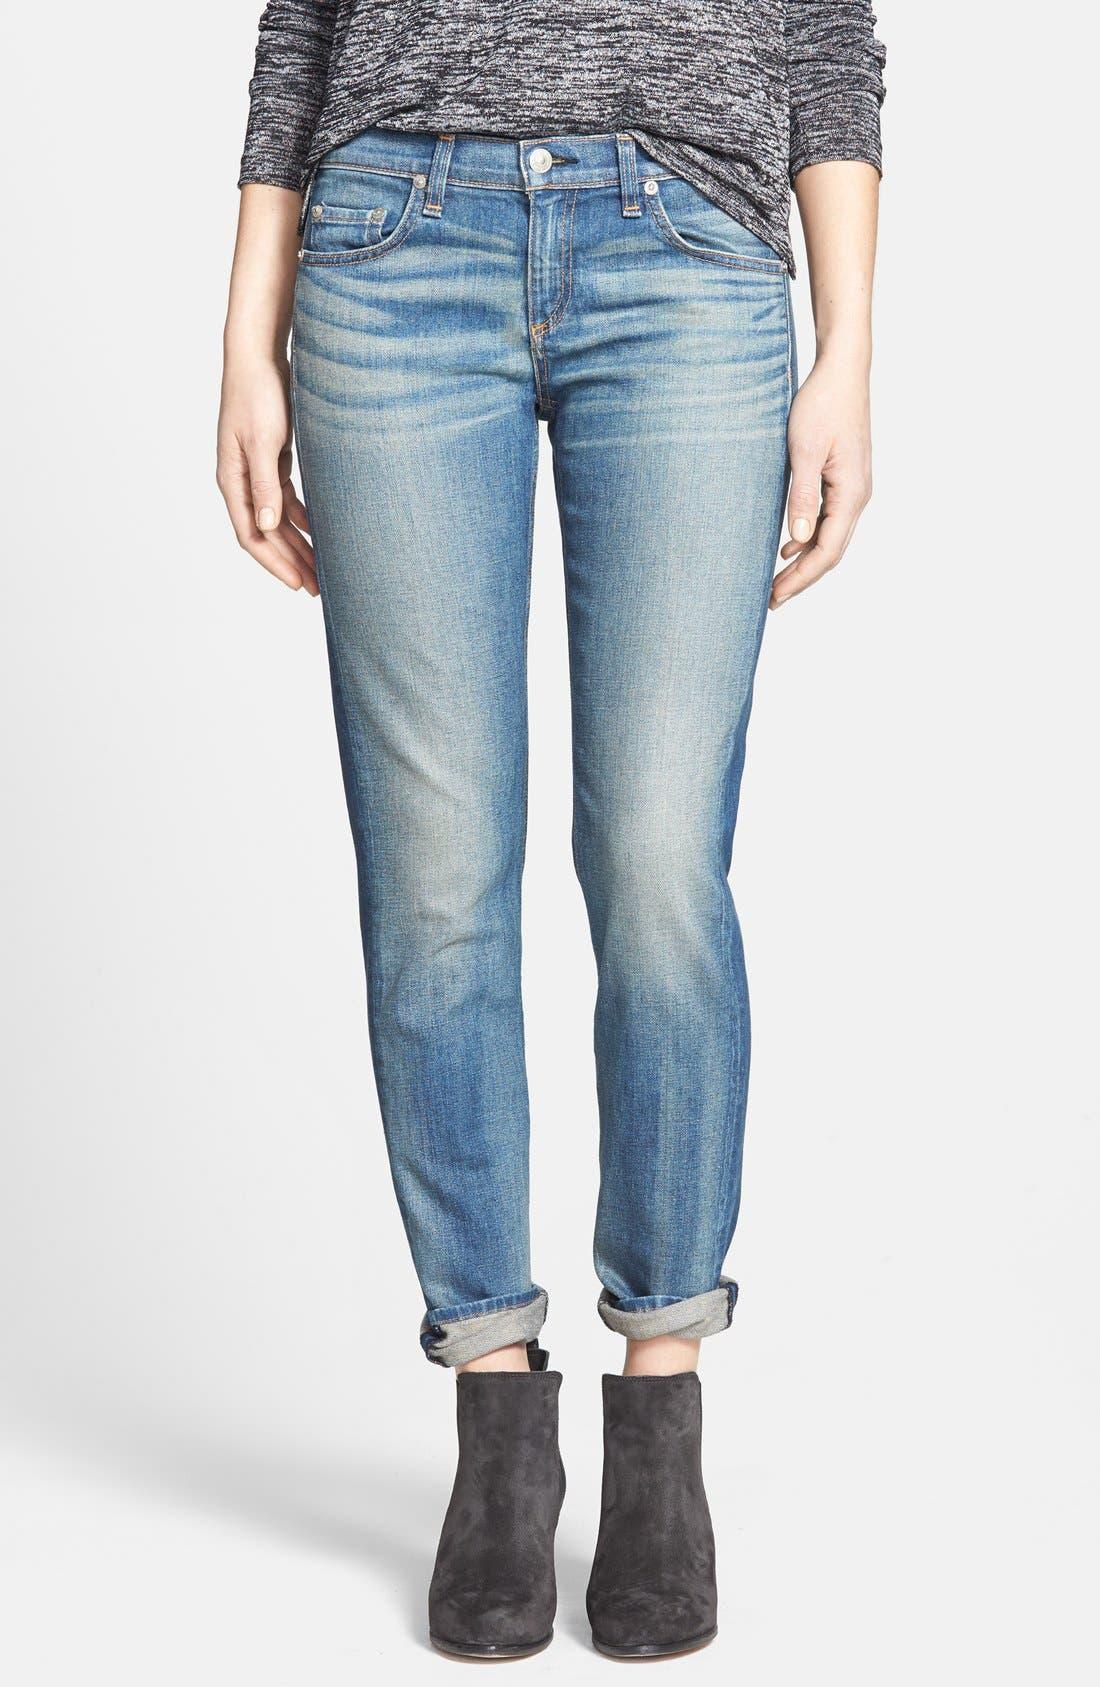 Main Image - rag & bone/JEAN 'The Dre' Slim Fit Boyfriend Jeans (Golden) (Nordstrom Exclusive)